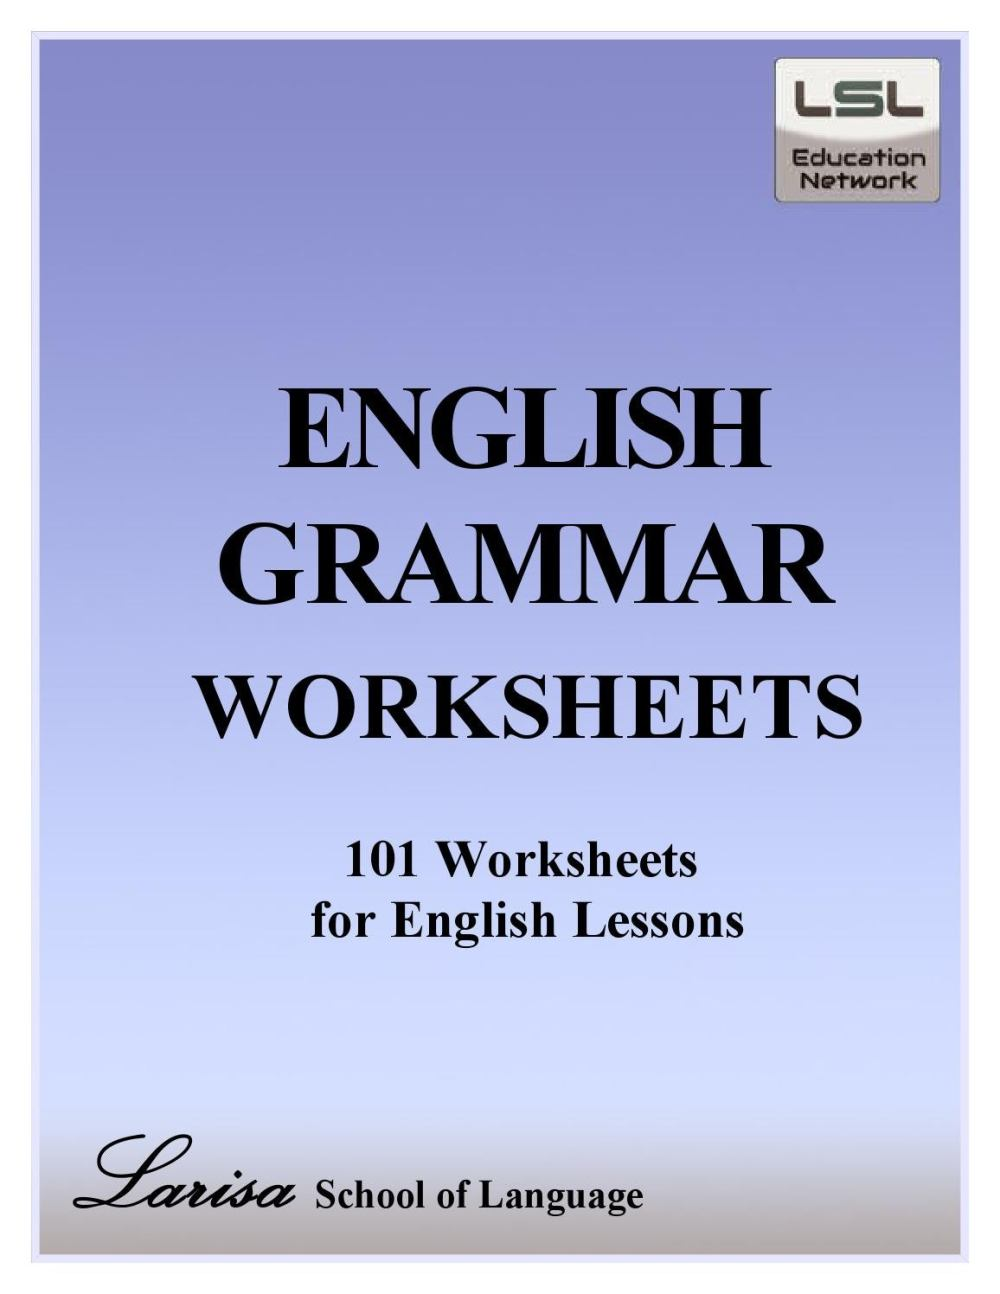 medium resolution of 101 English Grammar Worksheets for English Learners by Billgreen54 - issuu